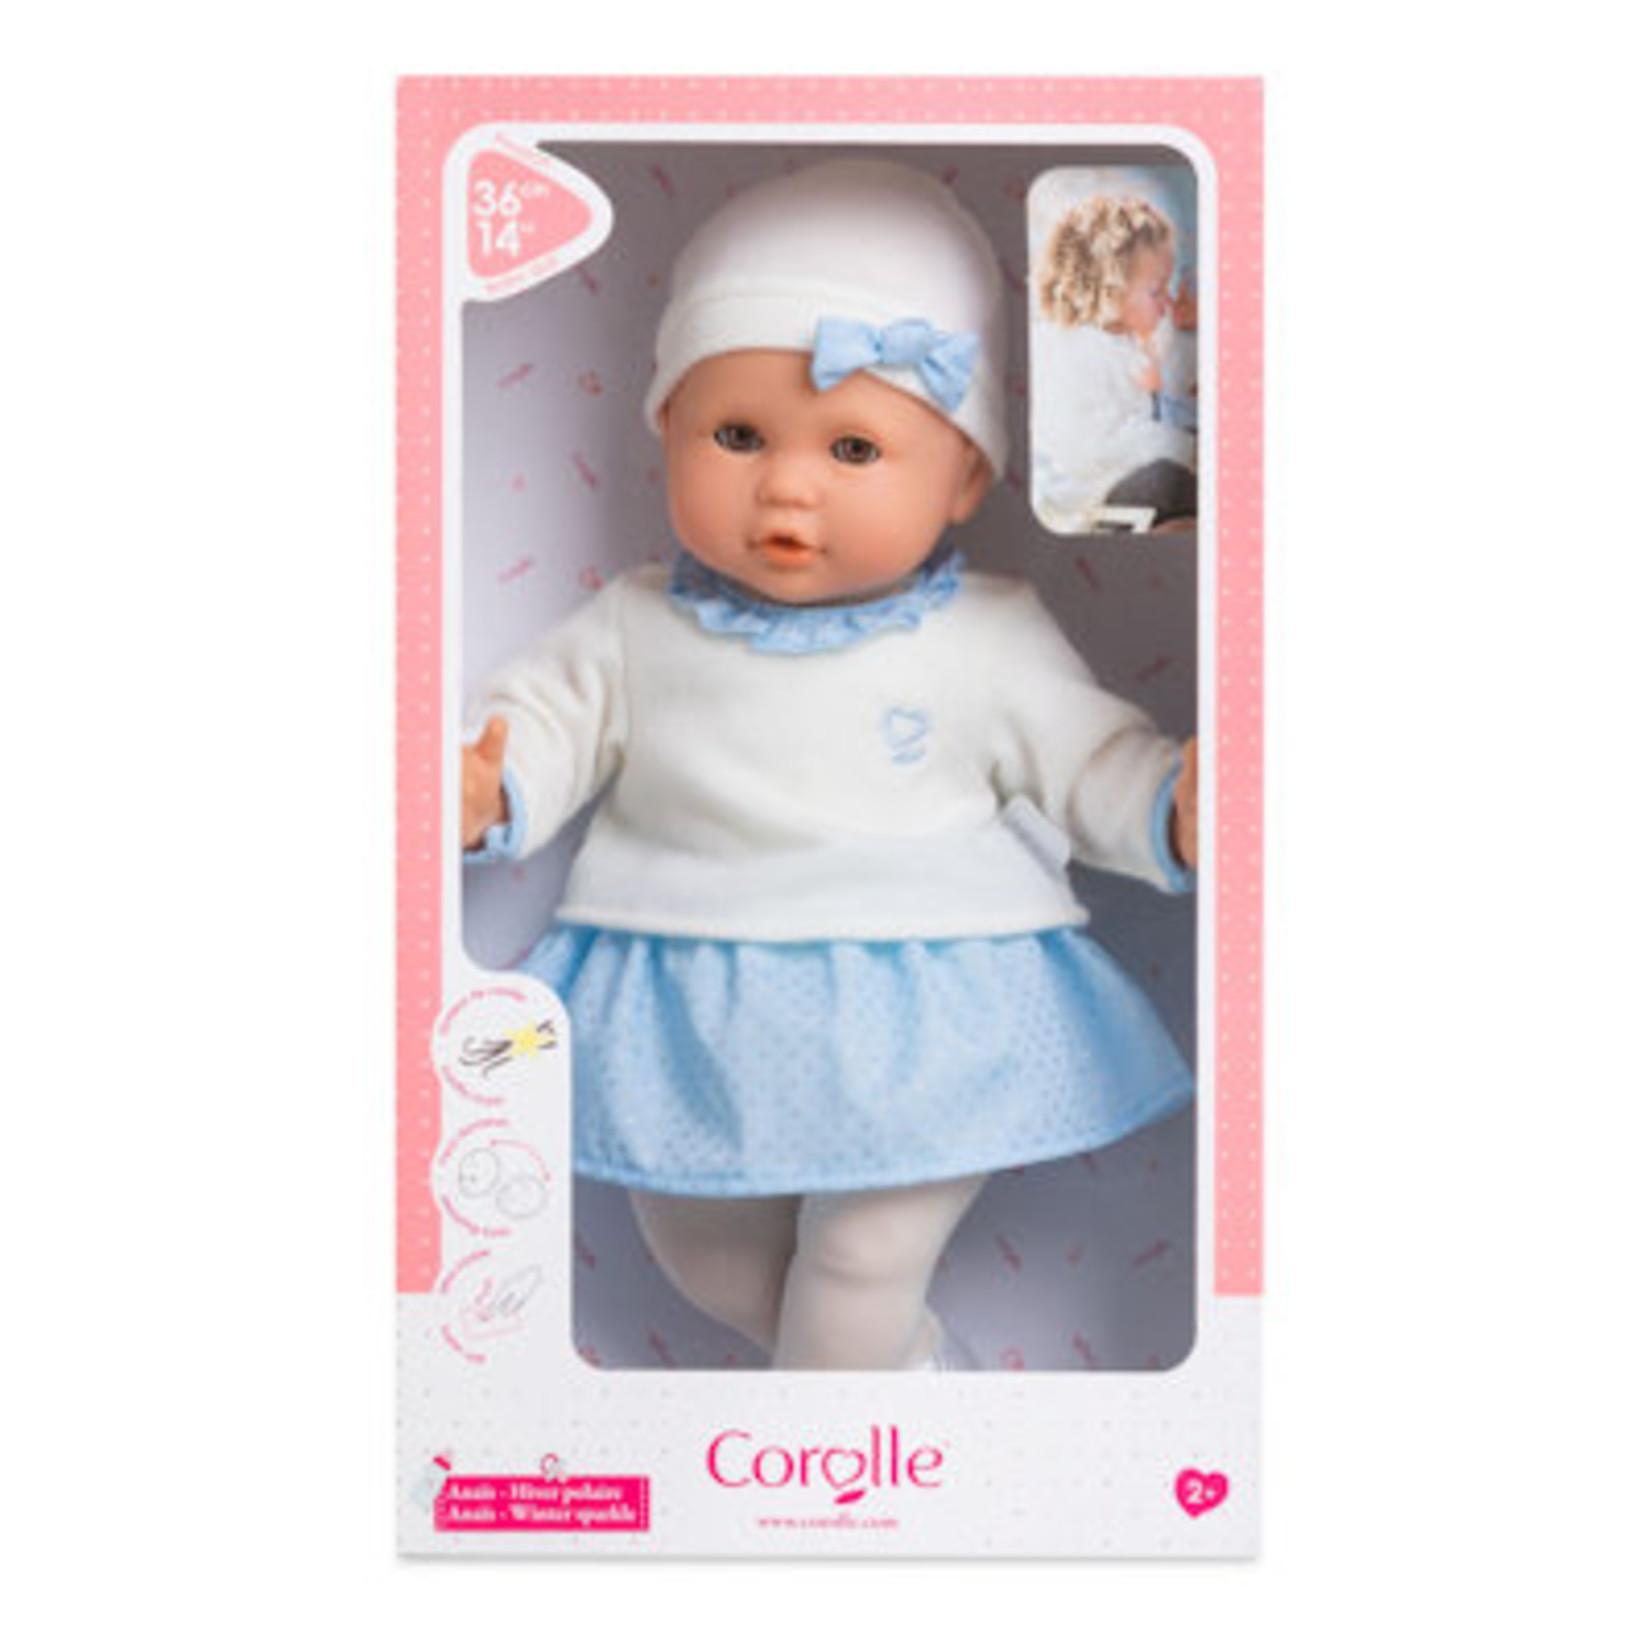 Corolle Corolle Babypop Anaìs 36 cm